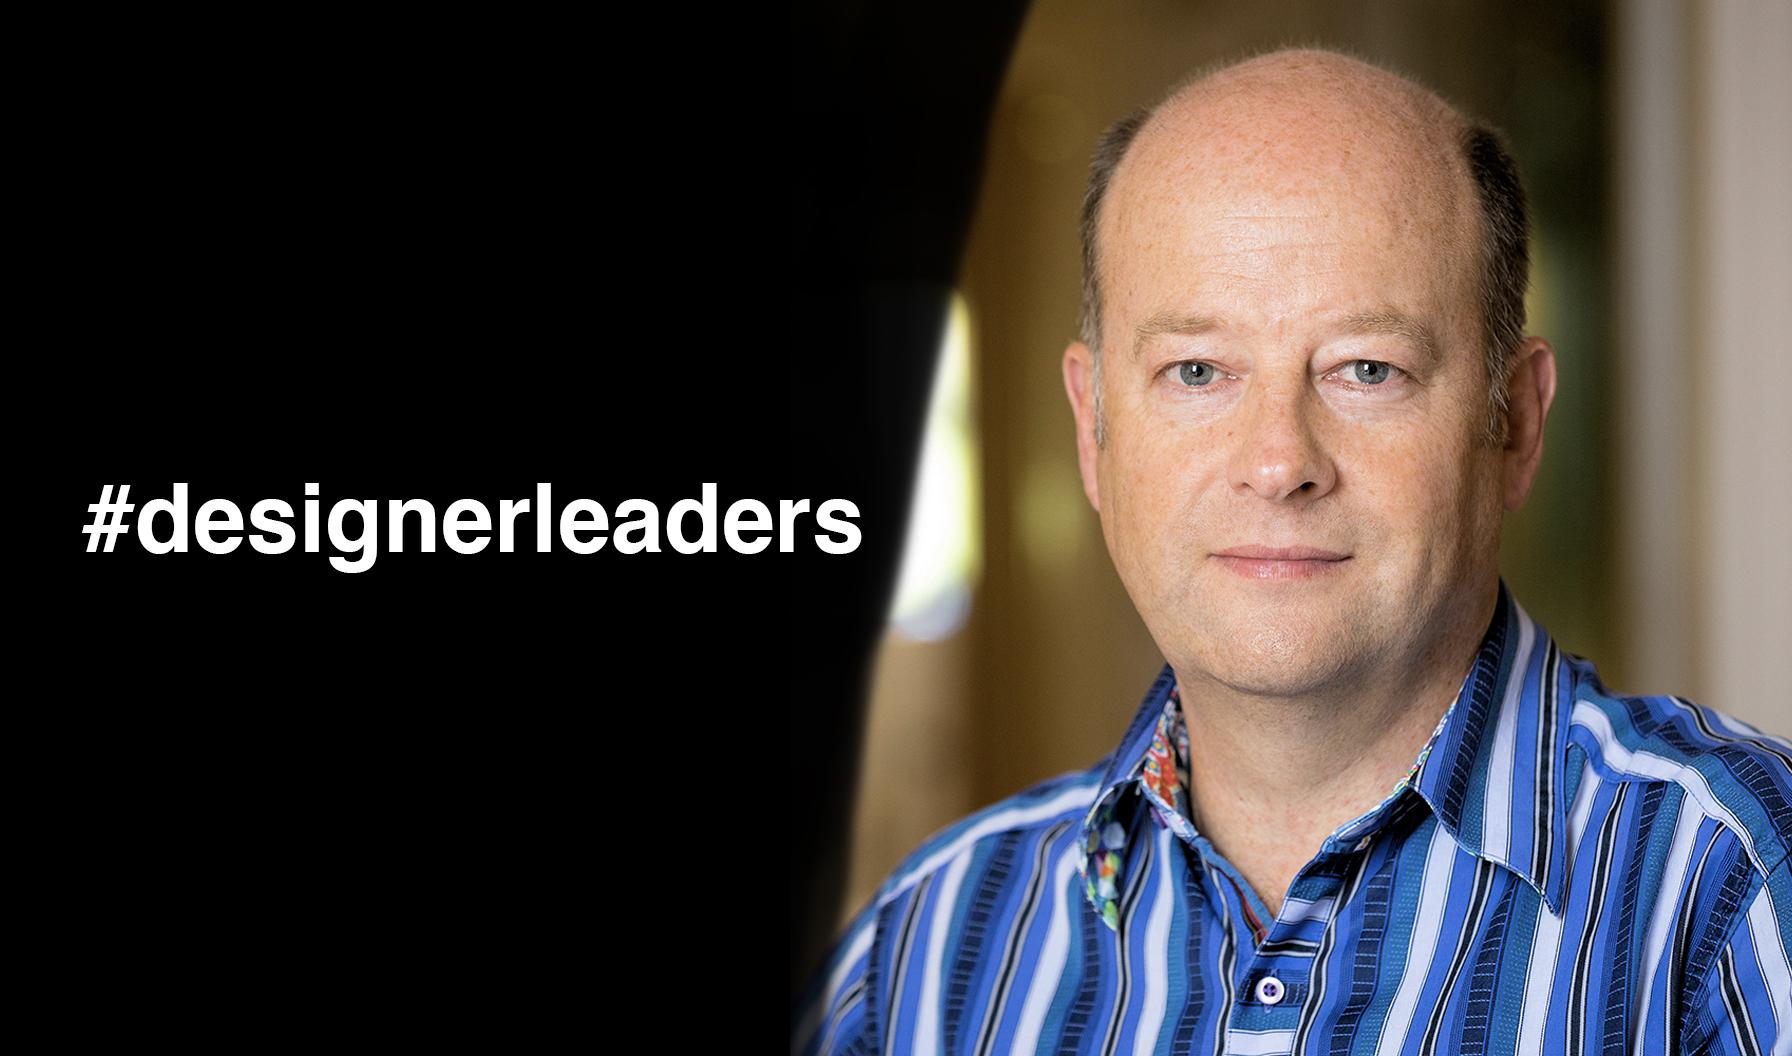 Designerati - Designerleaders - Simon Taylor